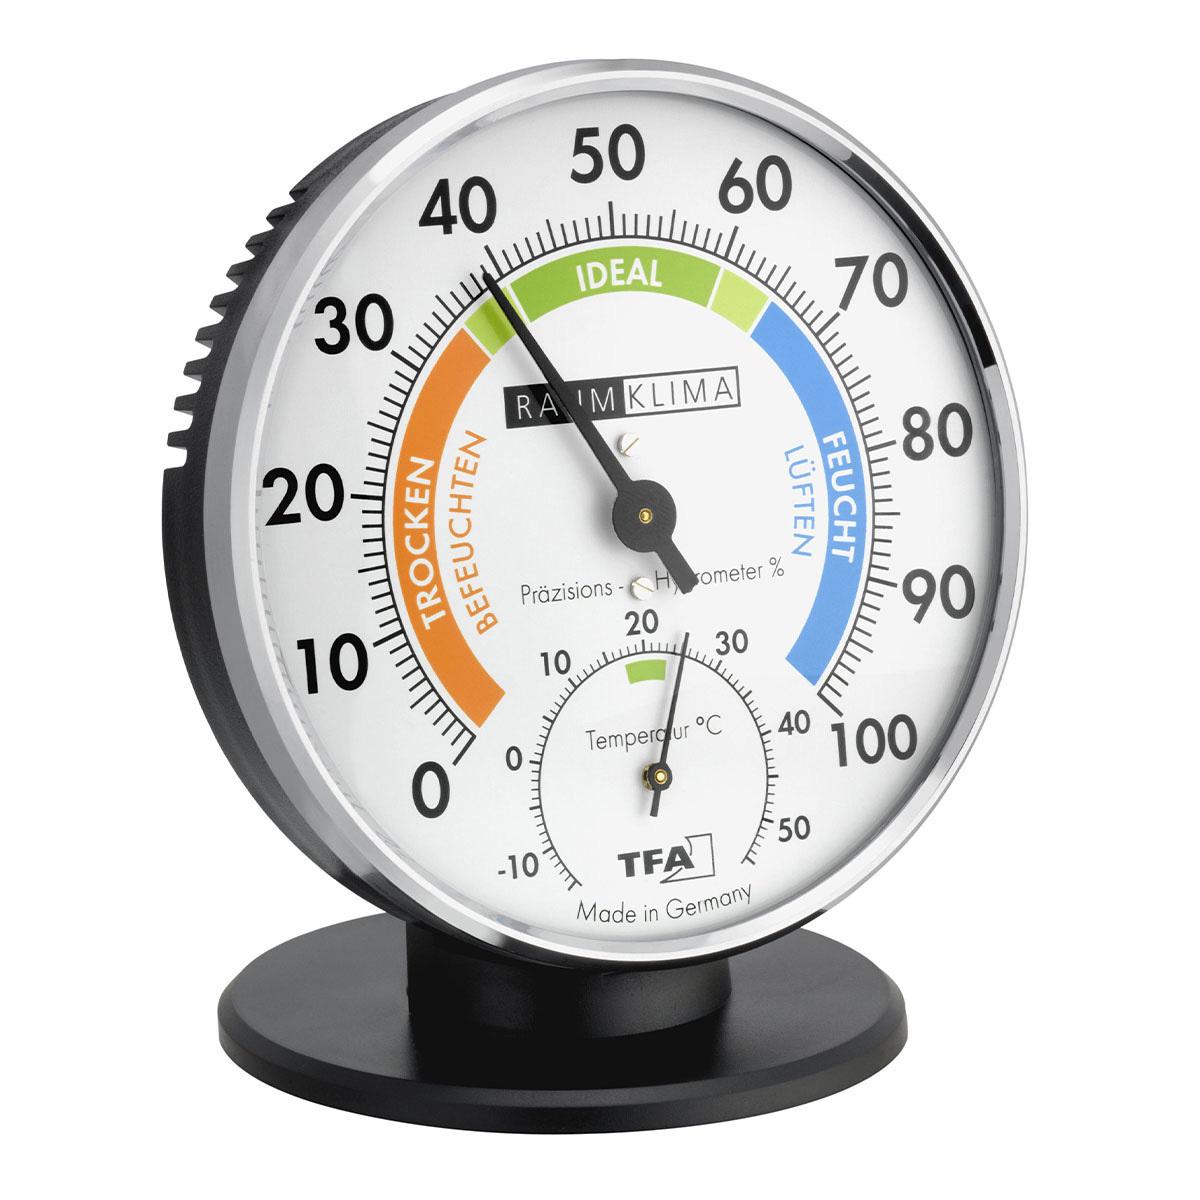 45-2033-analoges-thermo-hygrometer-mit-metallring-1200x1200px.jpg